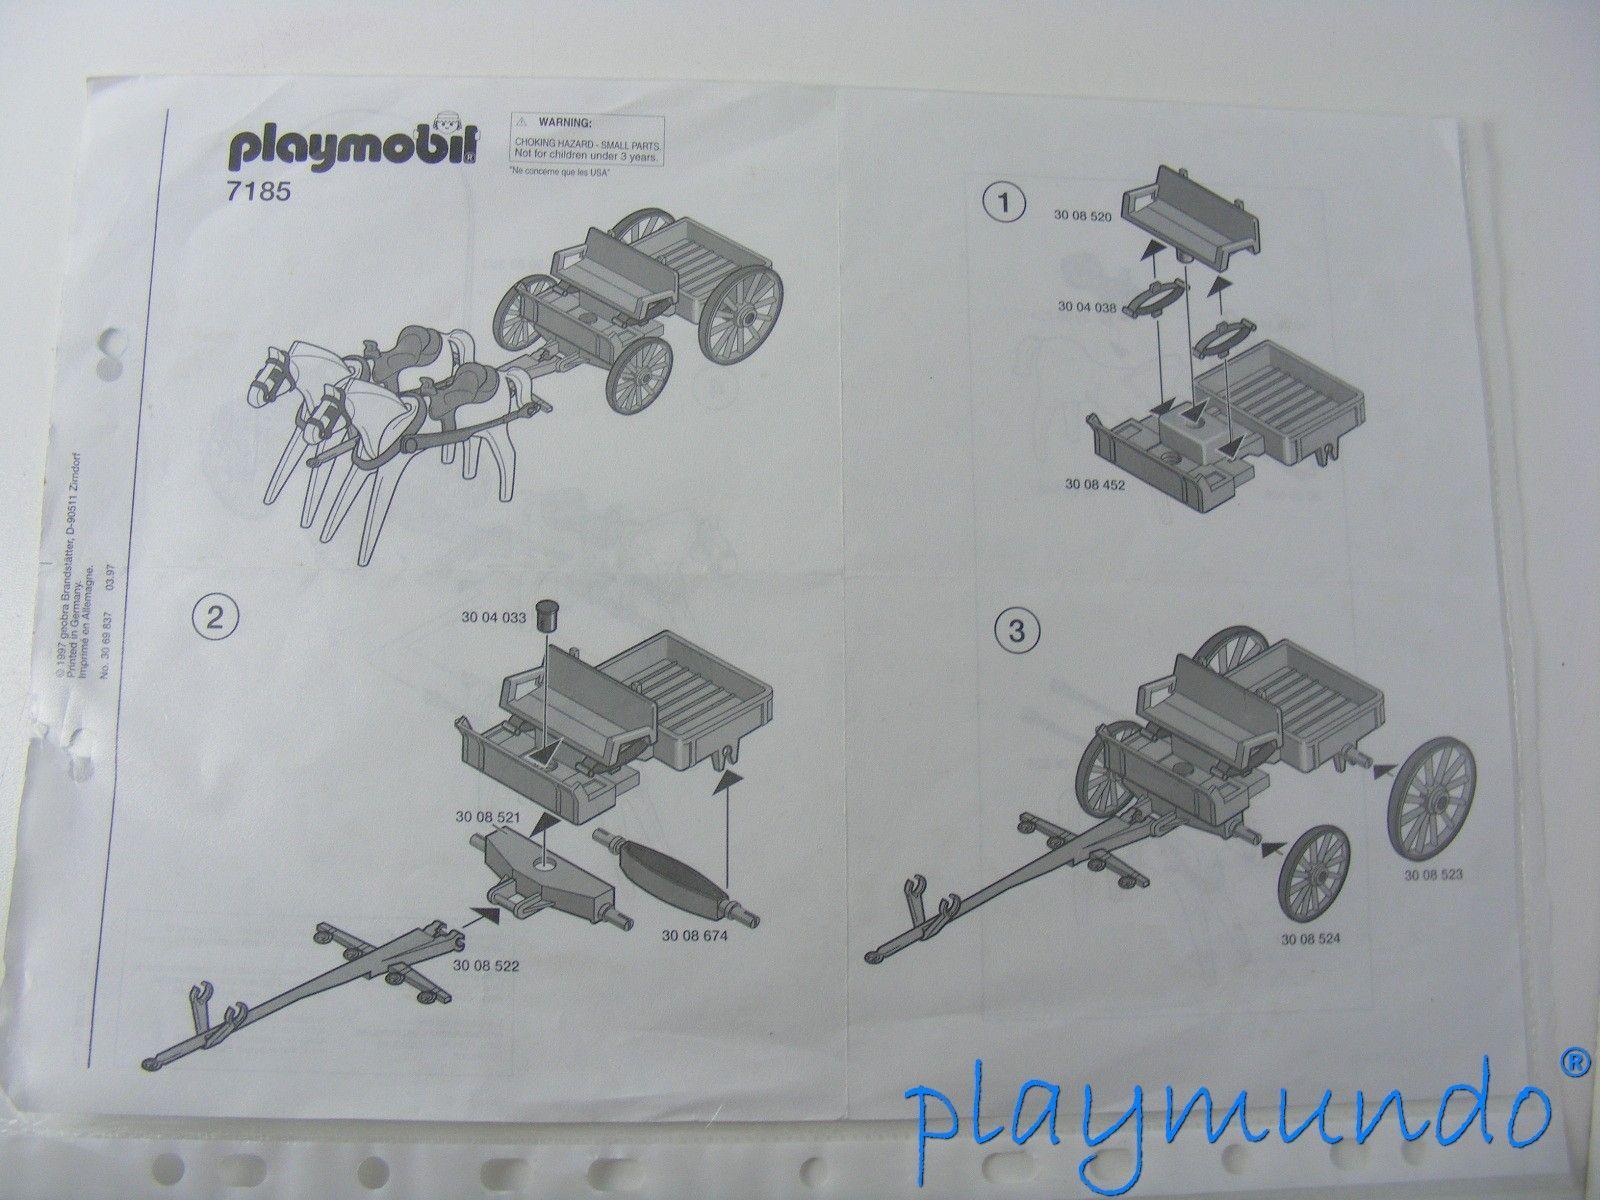 PLAYMOBIL 7185 CARRETA OESTE WESTERN